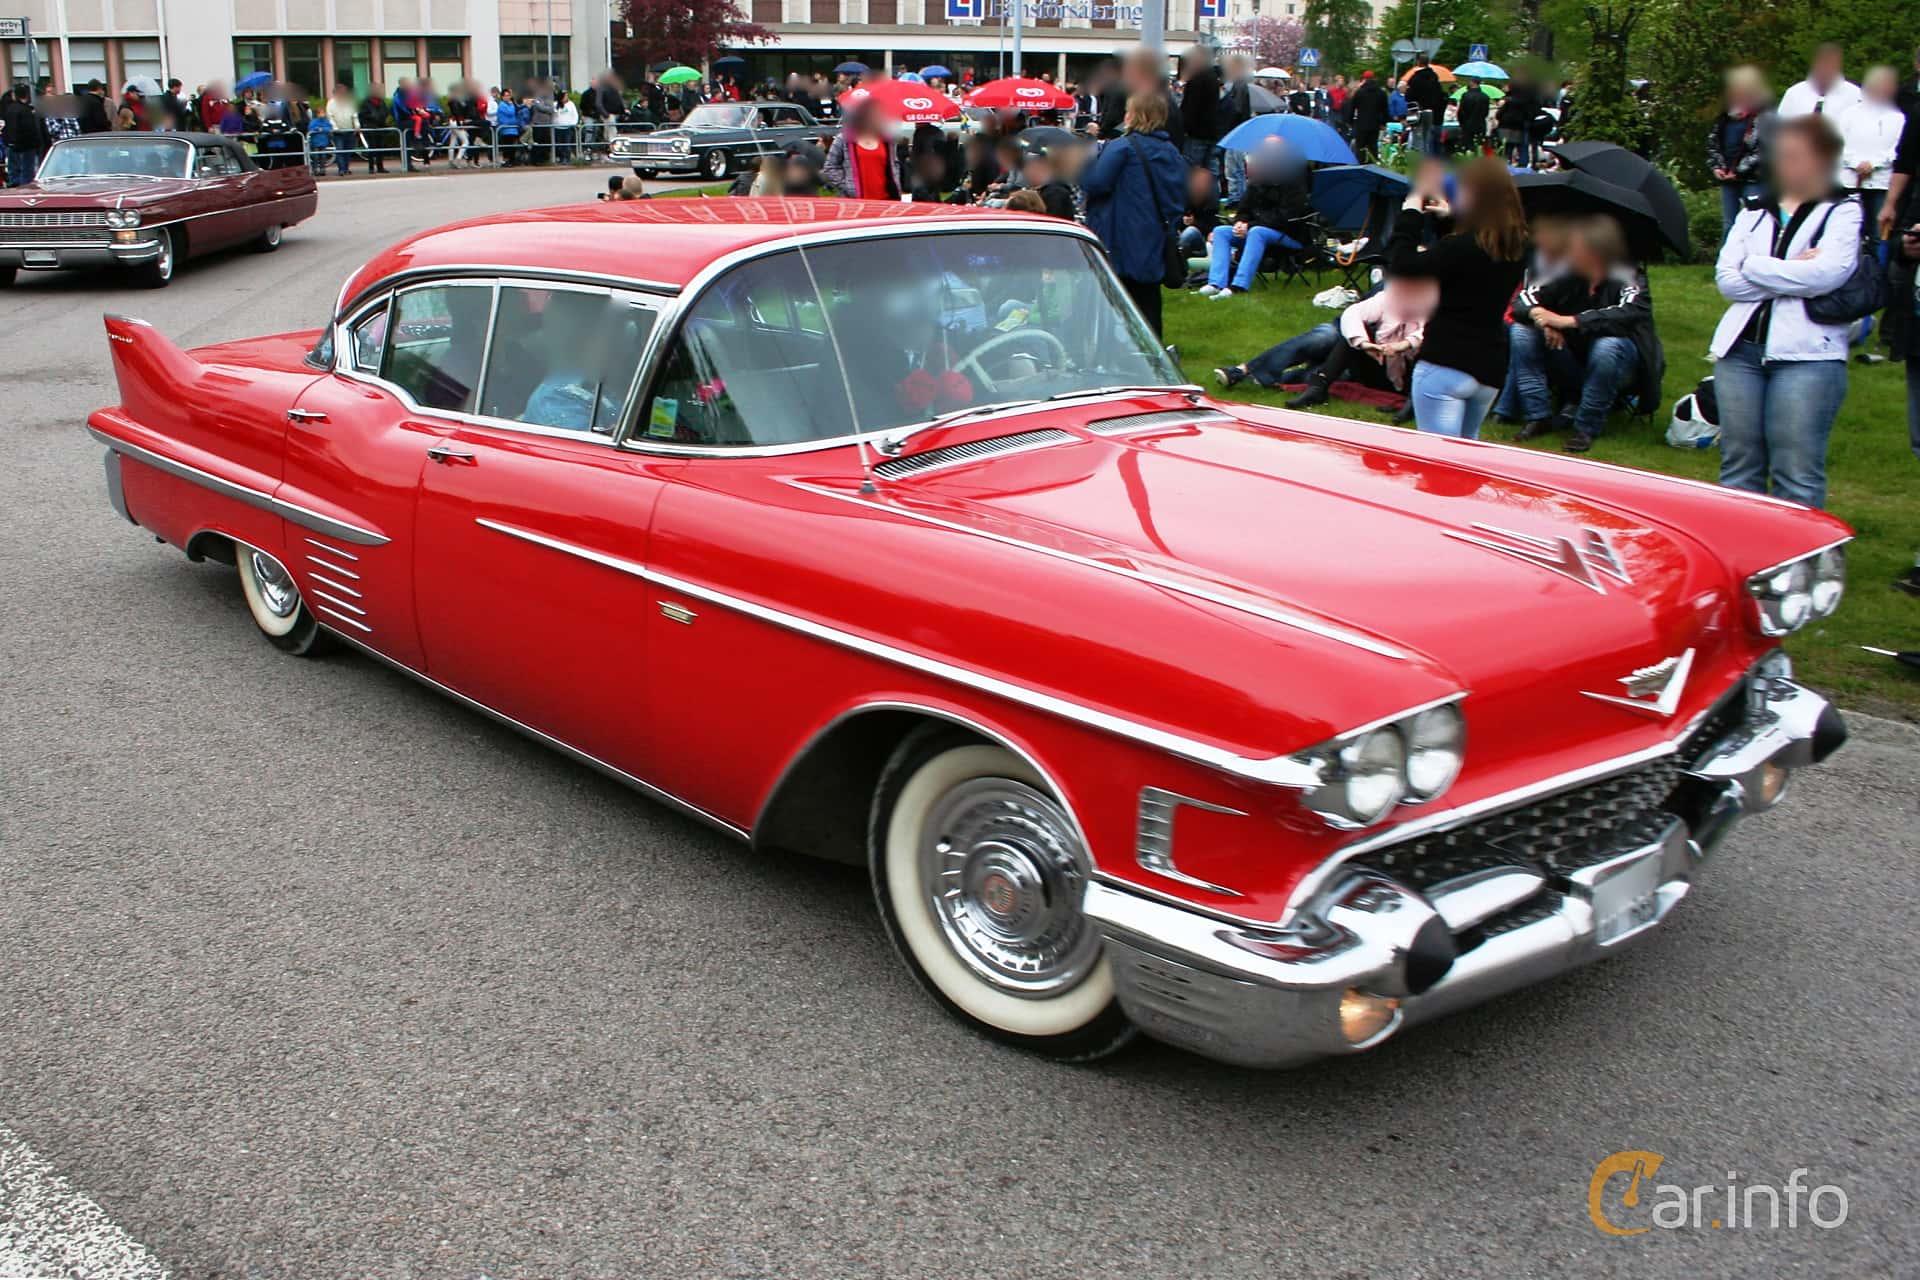 Cadillac Sixty-Two Sedan de Ville 6.0 V8 Automatic, 314hp, 1958